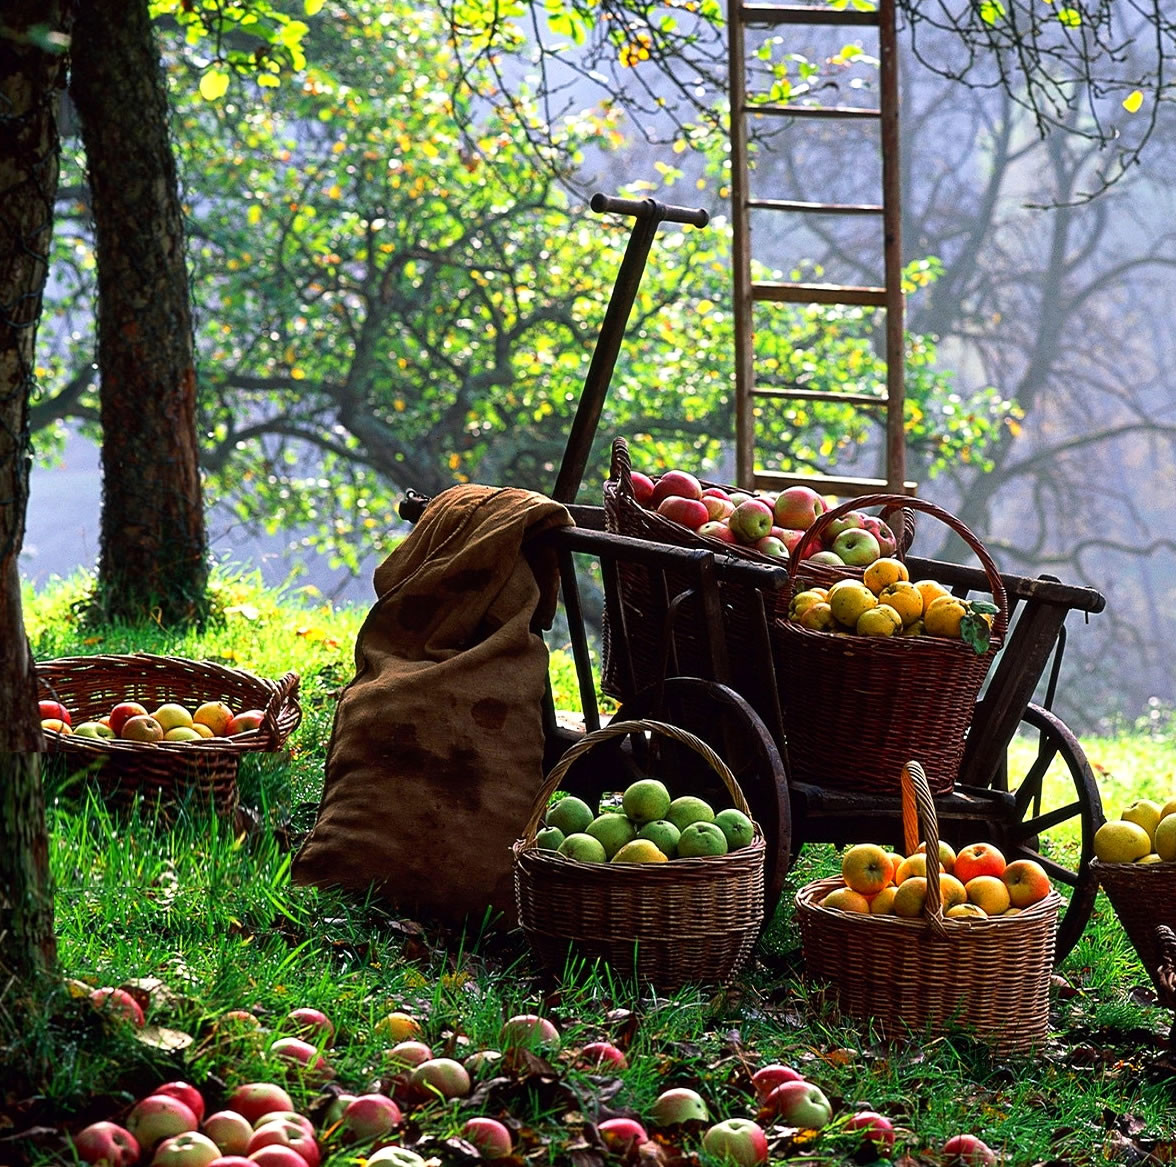 tuinieren, tuin oktober, tips voor tuin, vijvertips, fruittuin, groentetuin